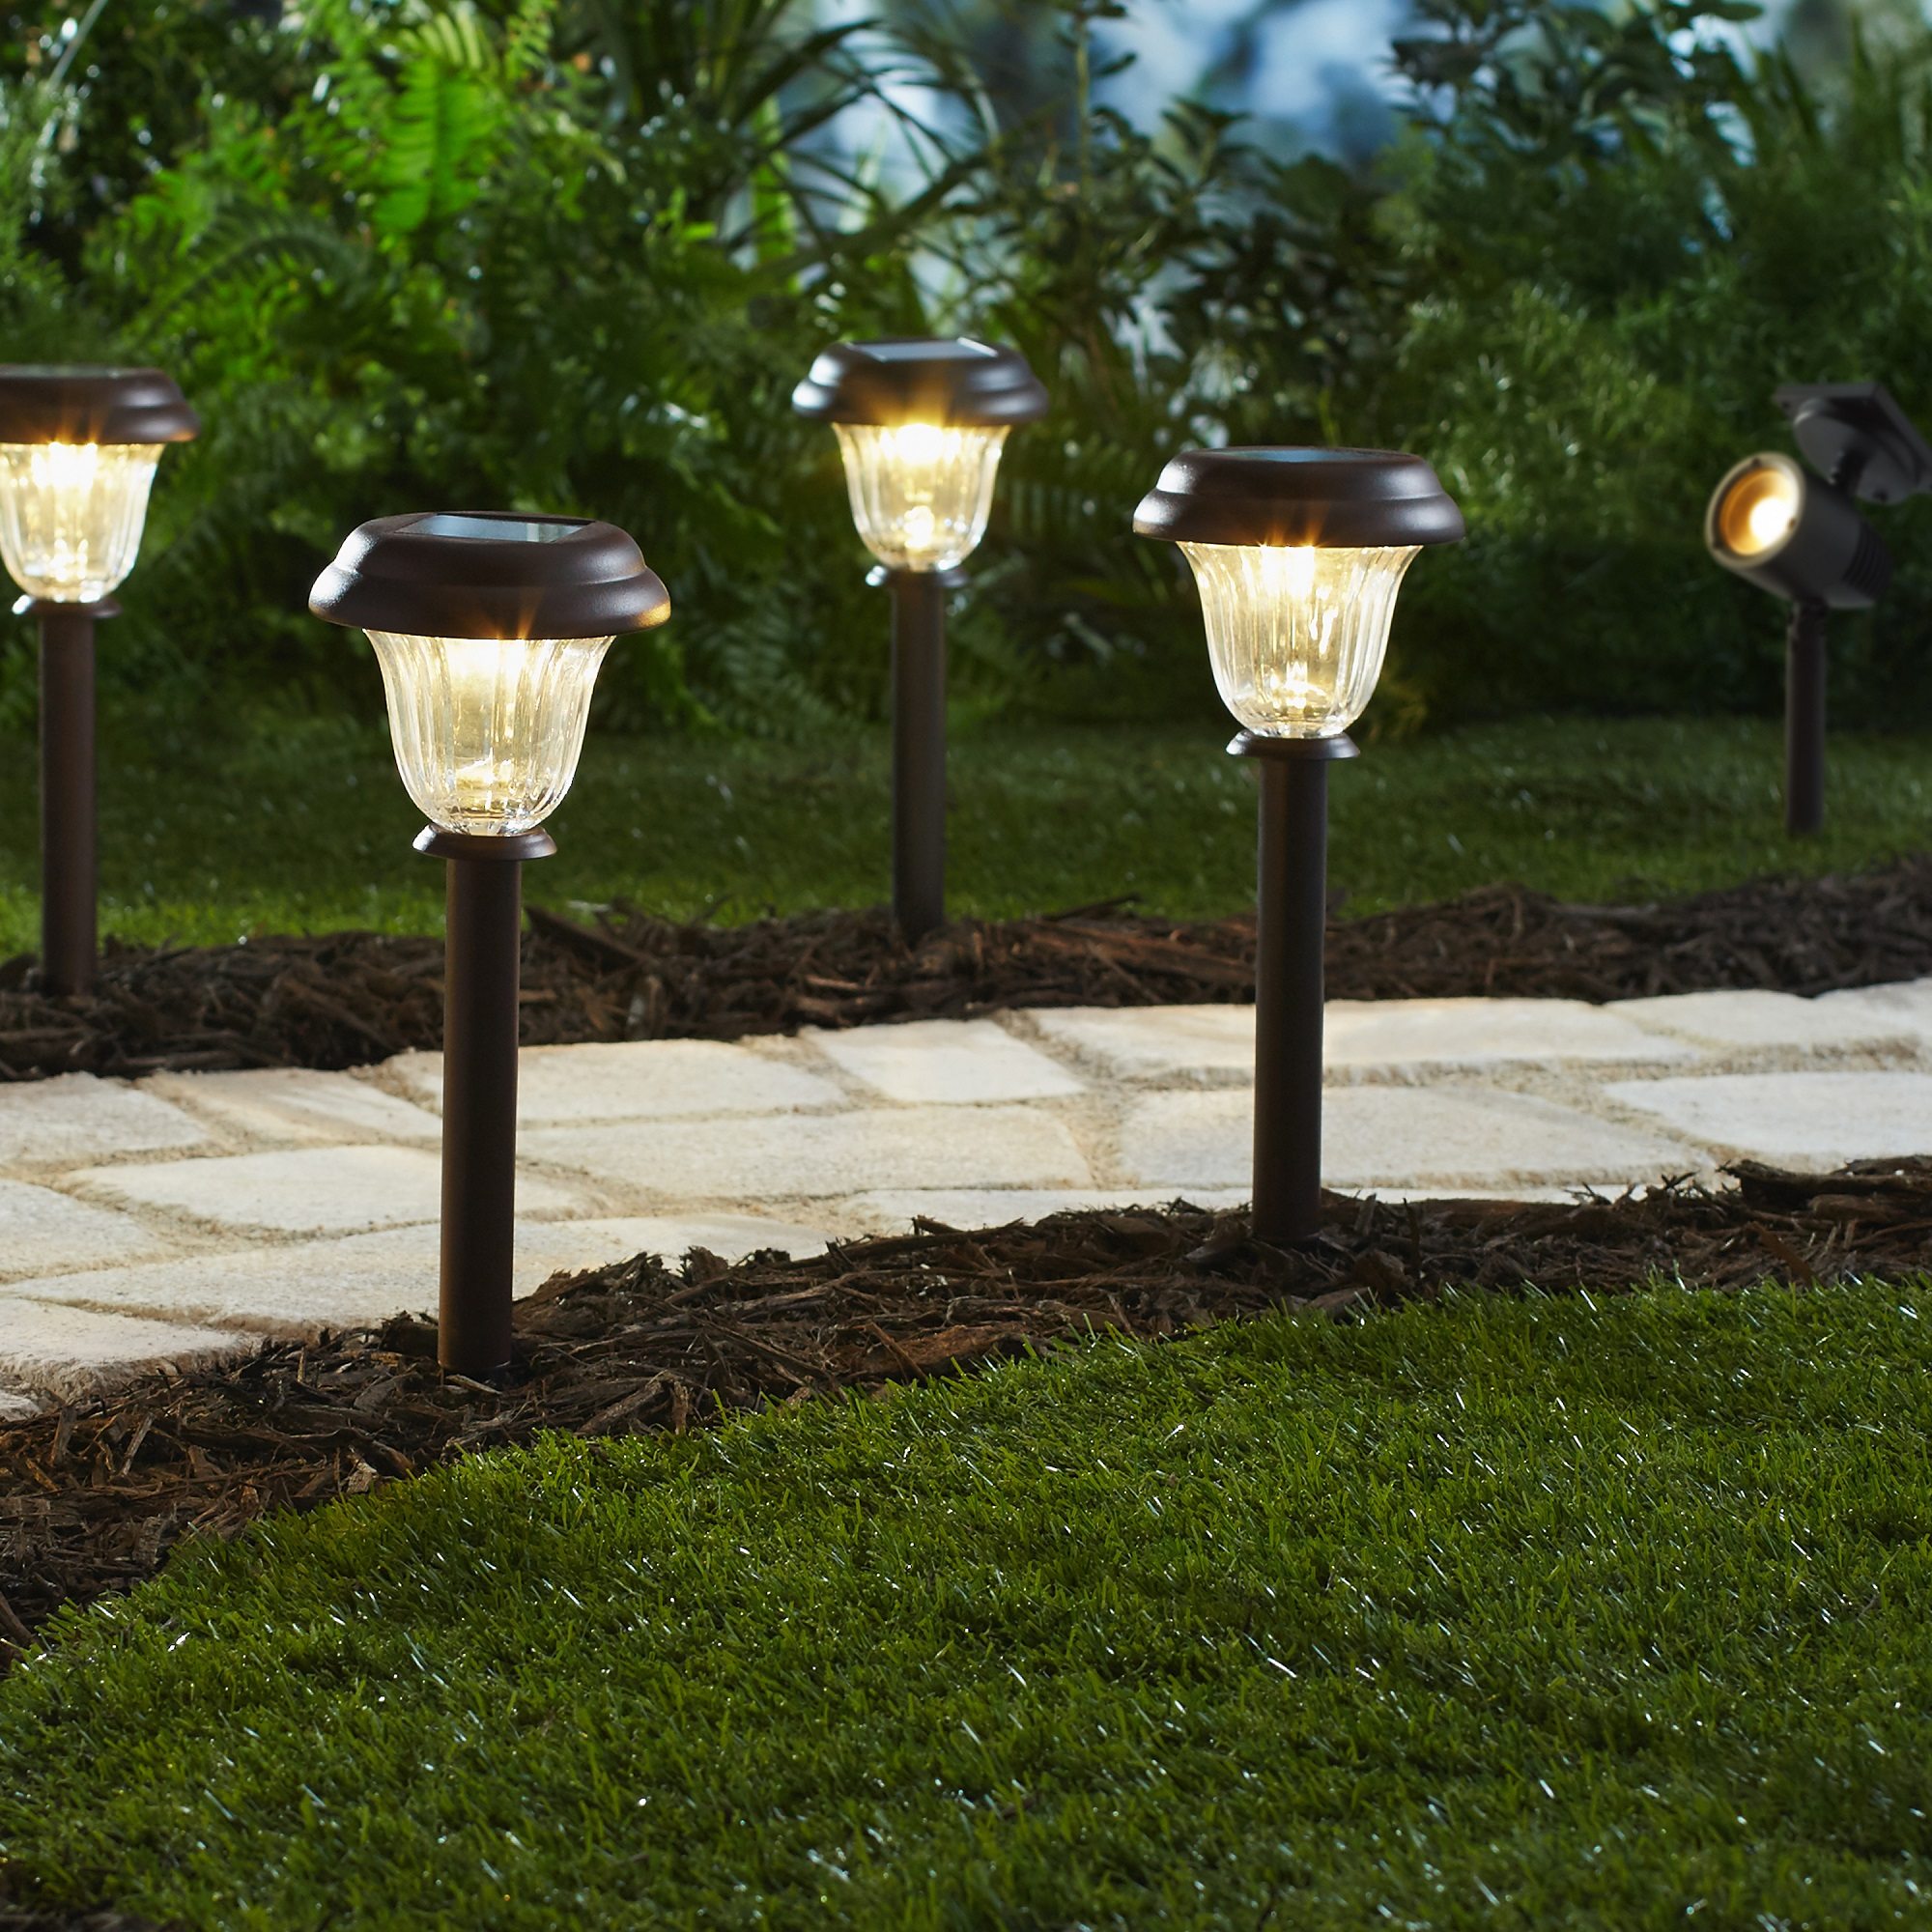 Mainstays 8 Piece Solar-Powered LED Pathway Lighting Set